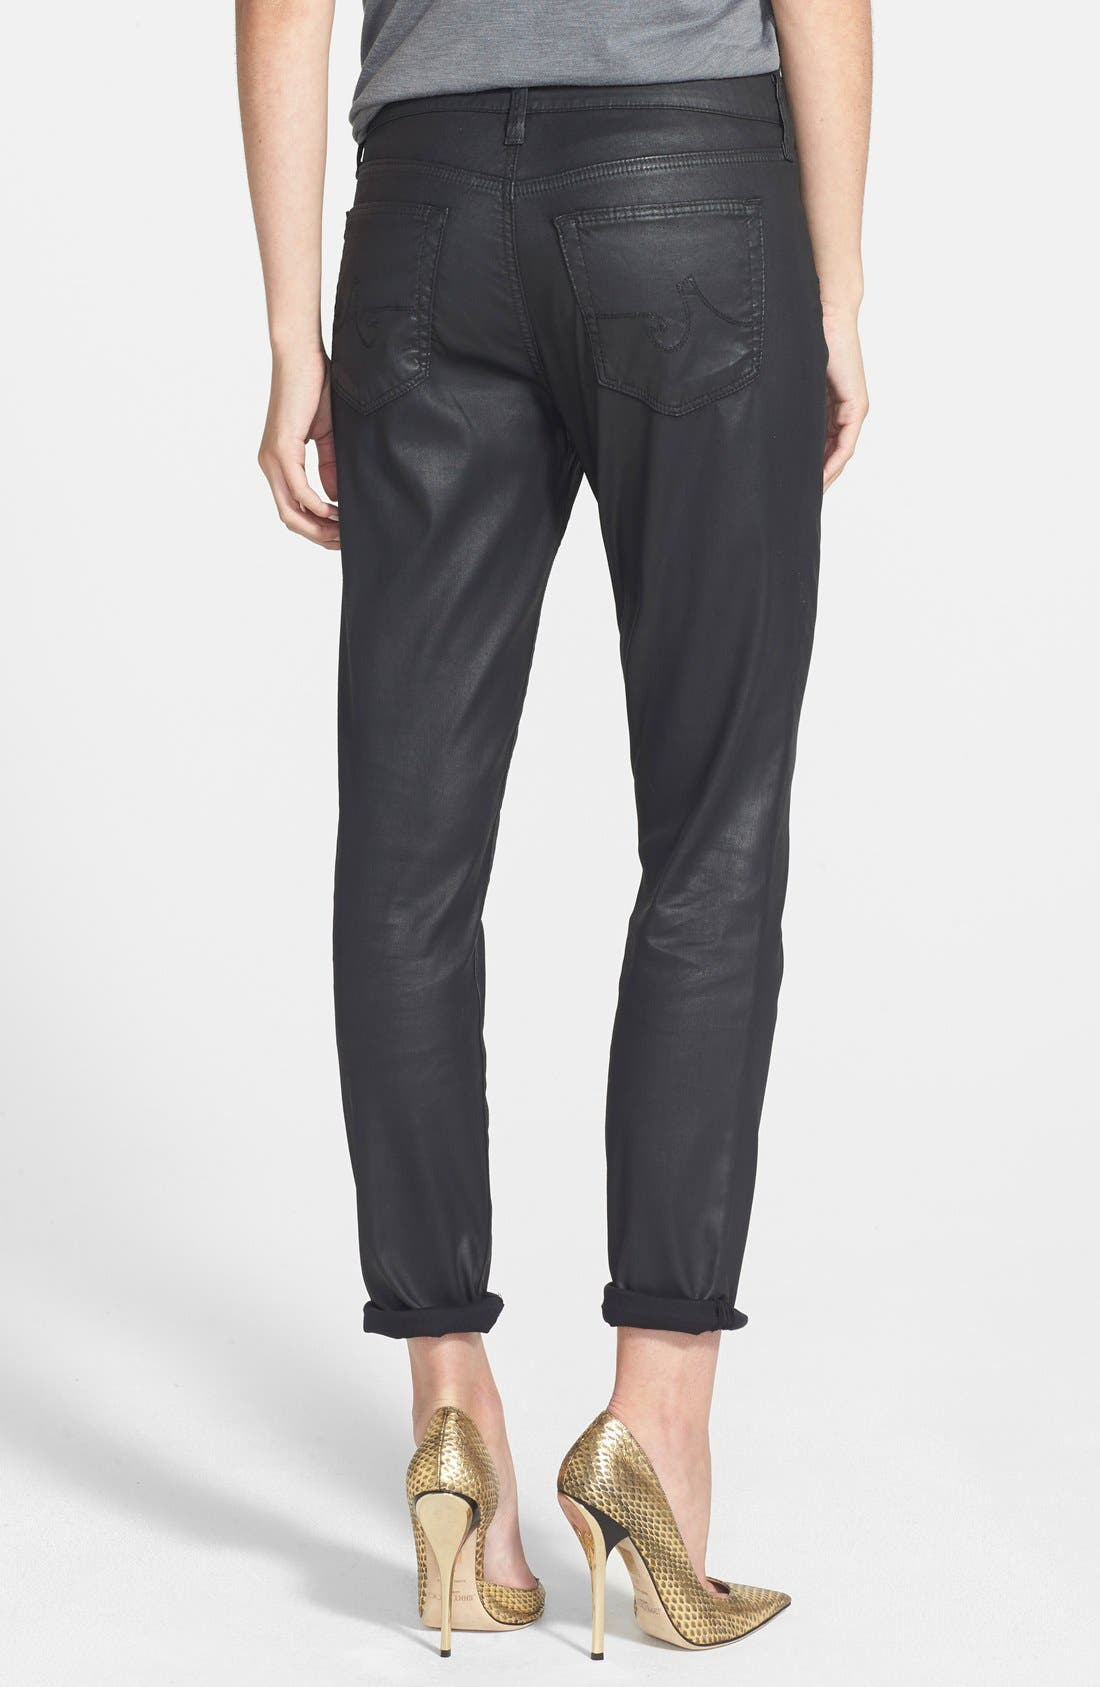 Alternate Image 2  - AG 'Leatherette Beau' Coated Boyfriend Skinny Jeans (Leatherette Black)